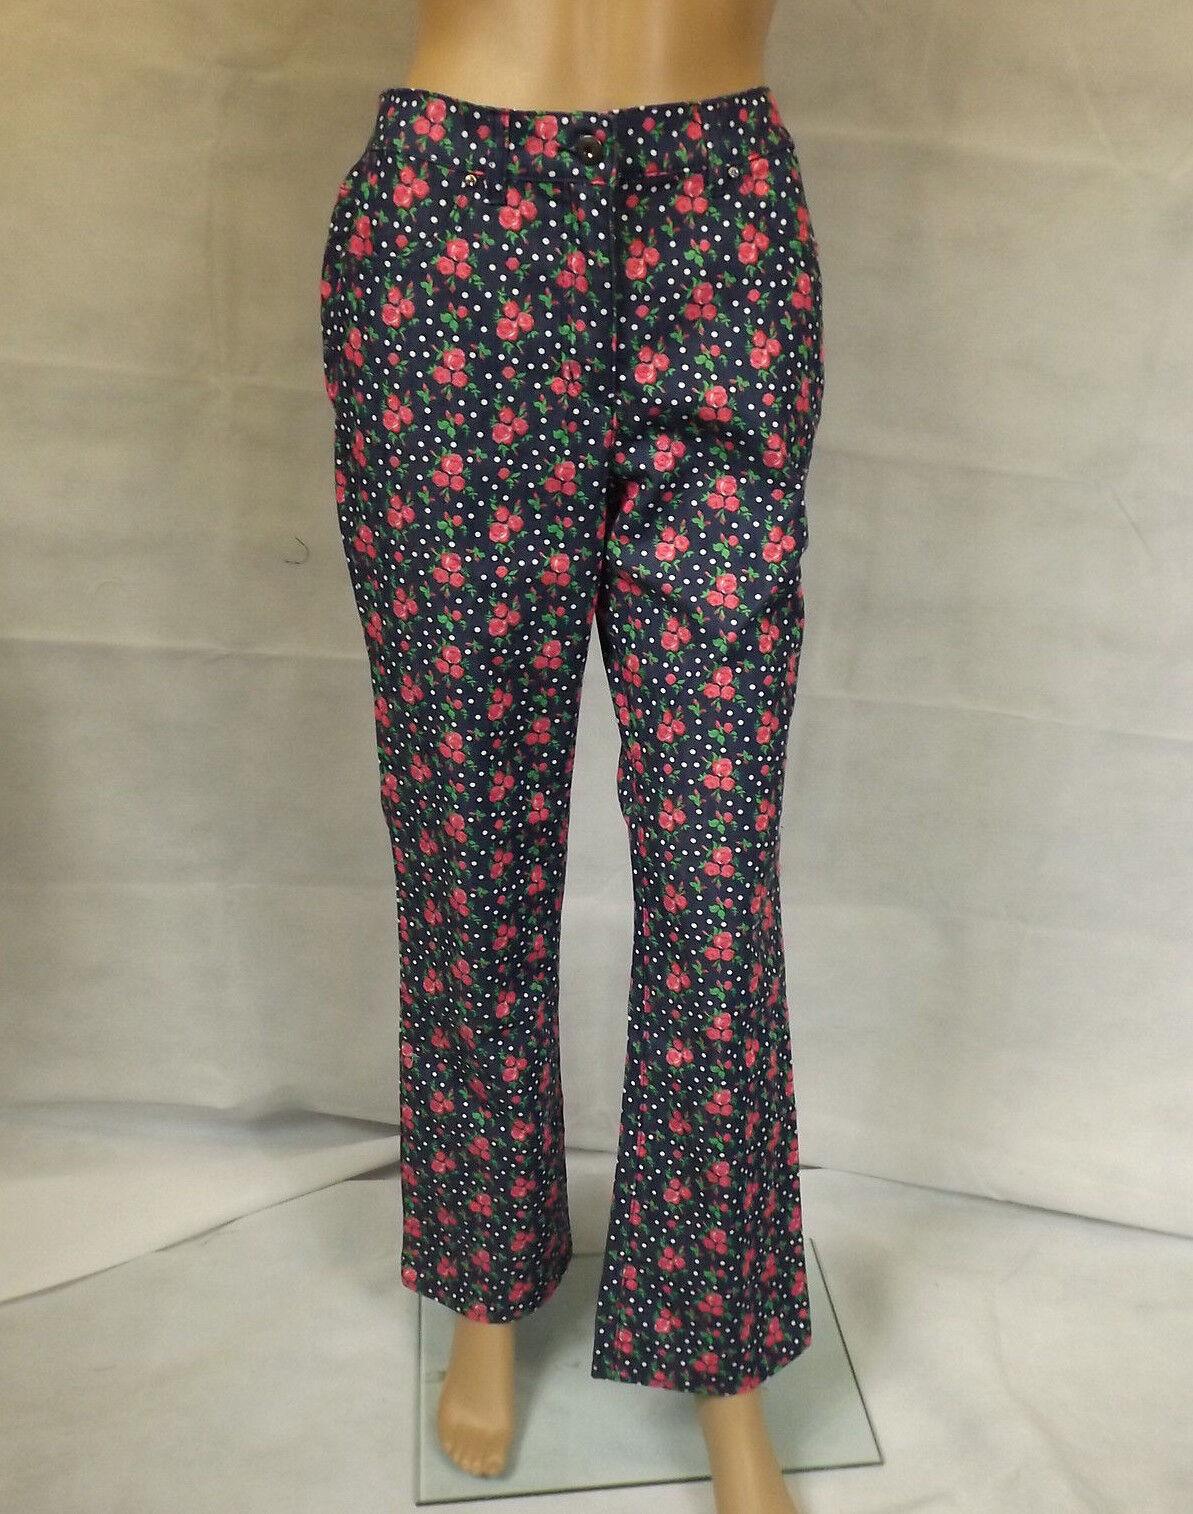 HIMMELBLAU by Lola Paltinger  18     Hippe Jeans m. Rosanprint  Stiefelcut   NEU | Ästhetisches Aussehen  0a7475